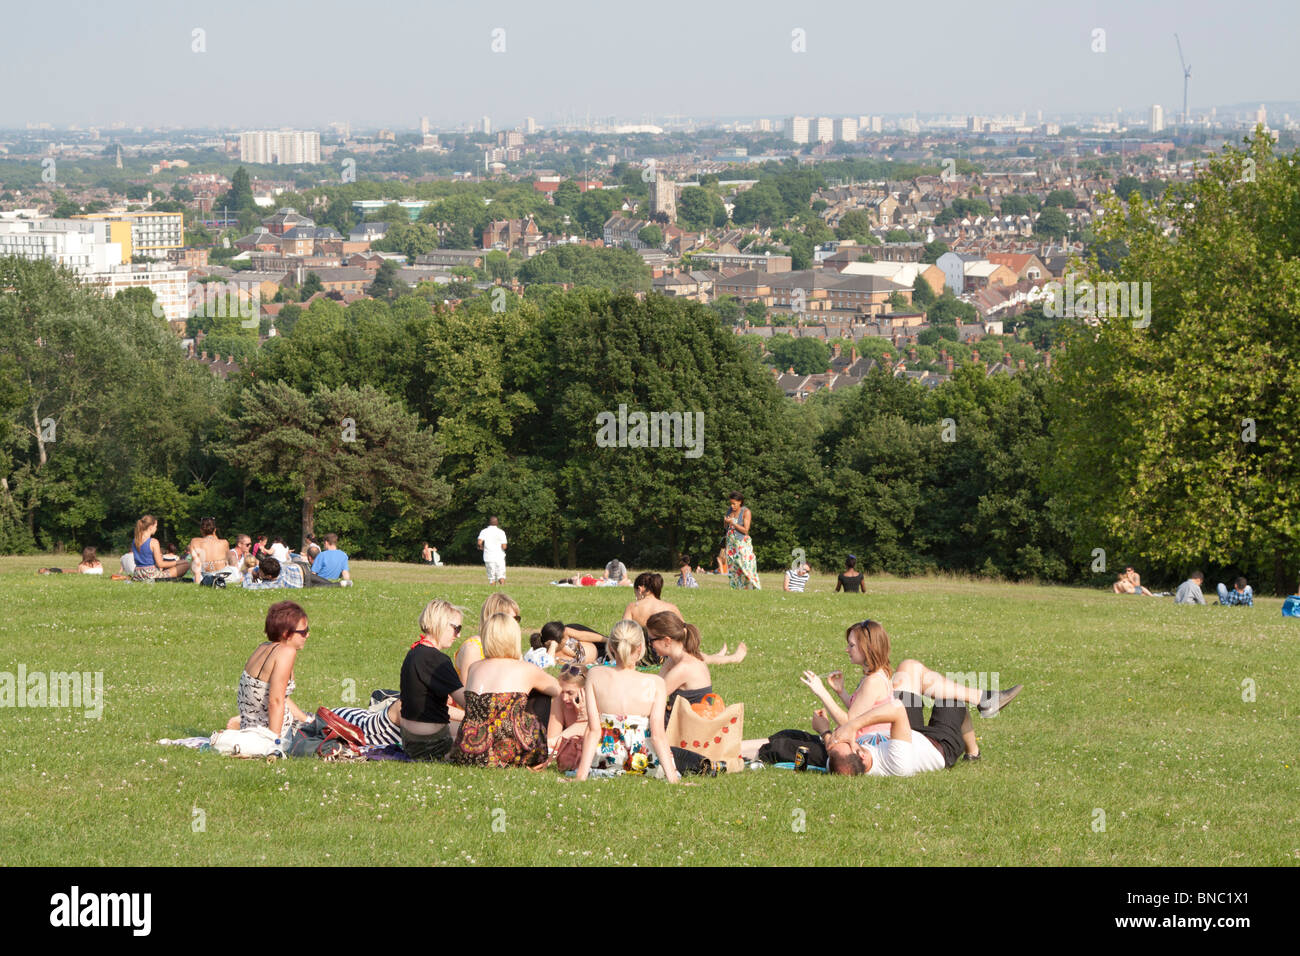 Views over London - Alexandra Park - Haringey. - Stock Image